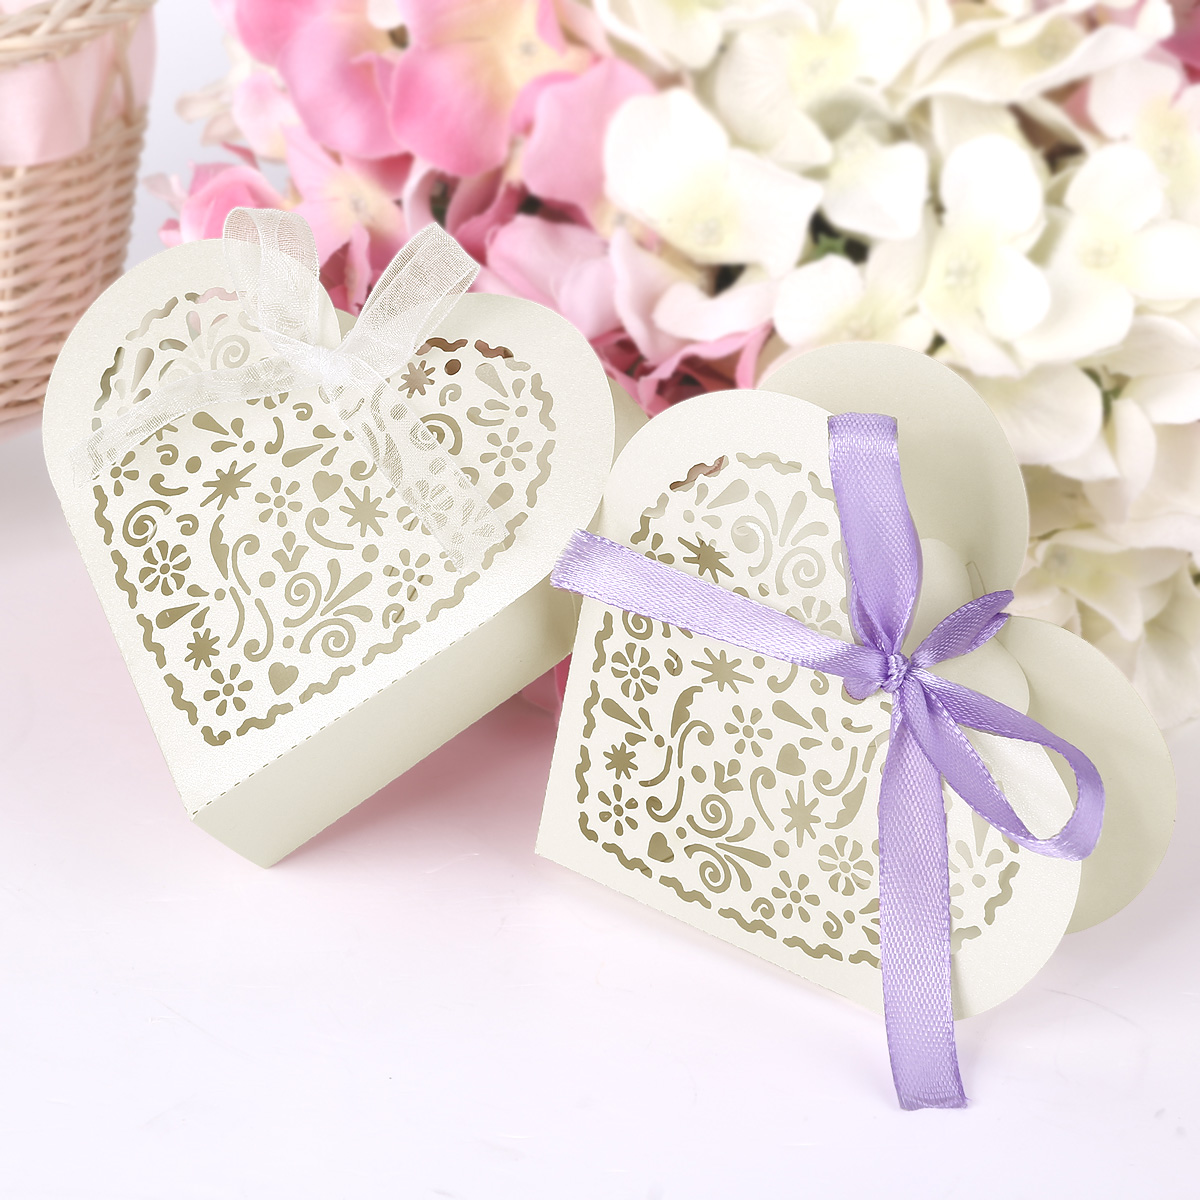 25 Heart Shape Laser Cut Bomboniere Boxes Wedding Favor Shower Candy ...